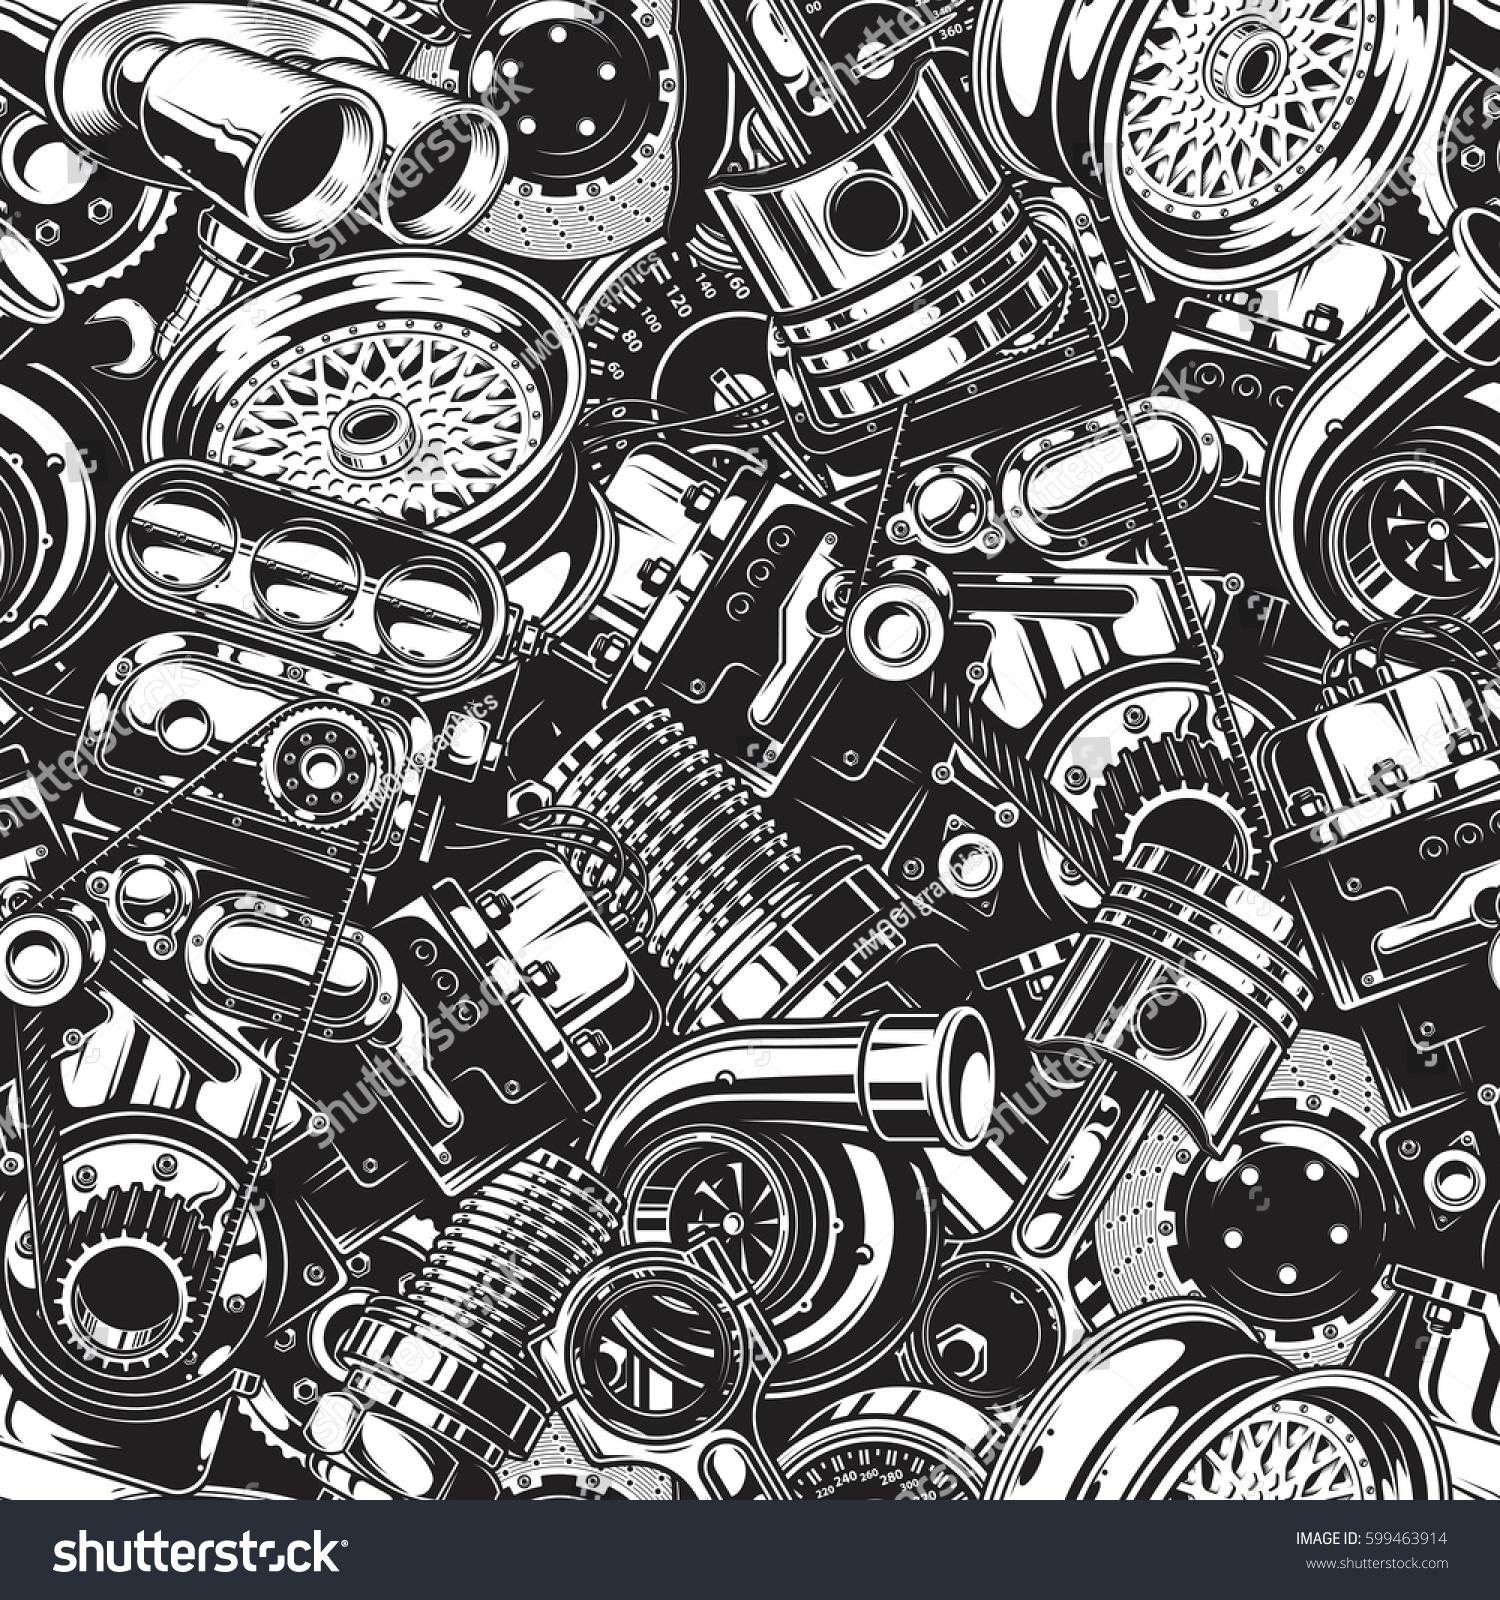 Car Engine Wallpaper: Automobile Car Parts Seamless Pattern Monochrome Stock